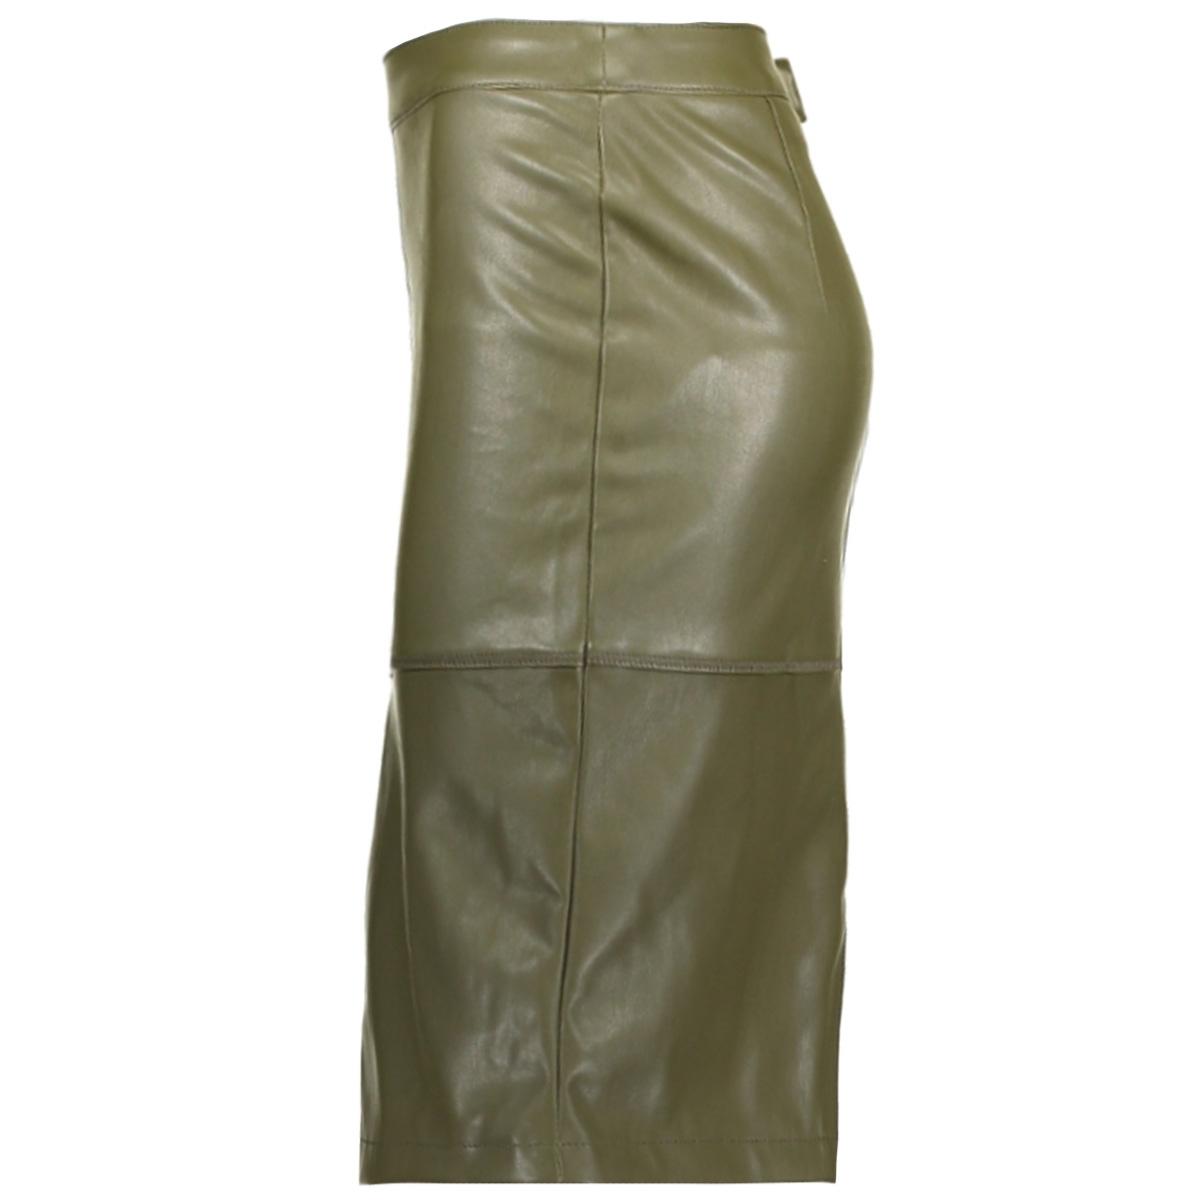 vipen new skirt-noos 14033417 vila rok ivy green